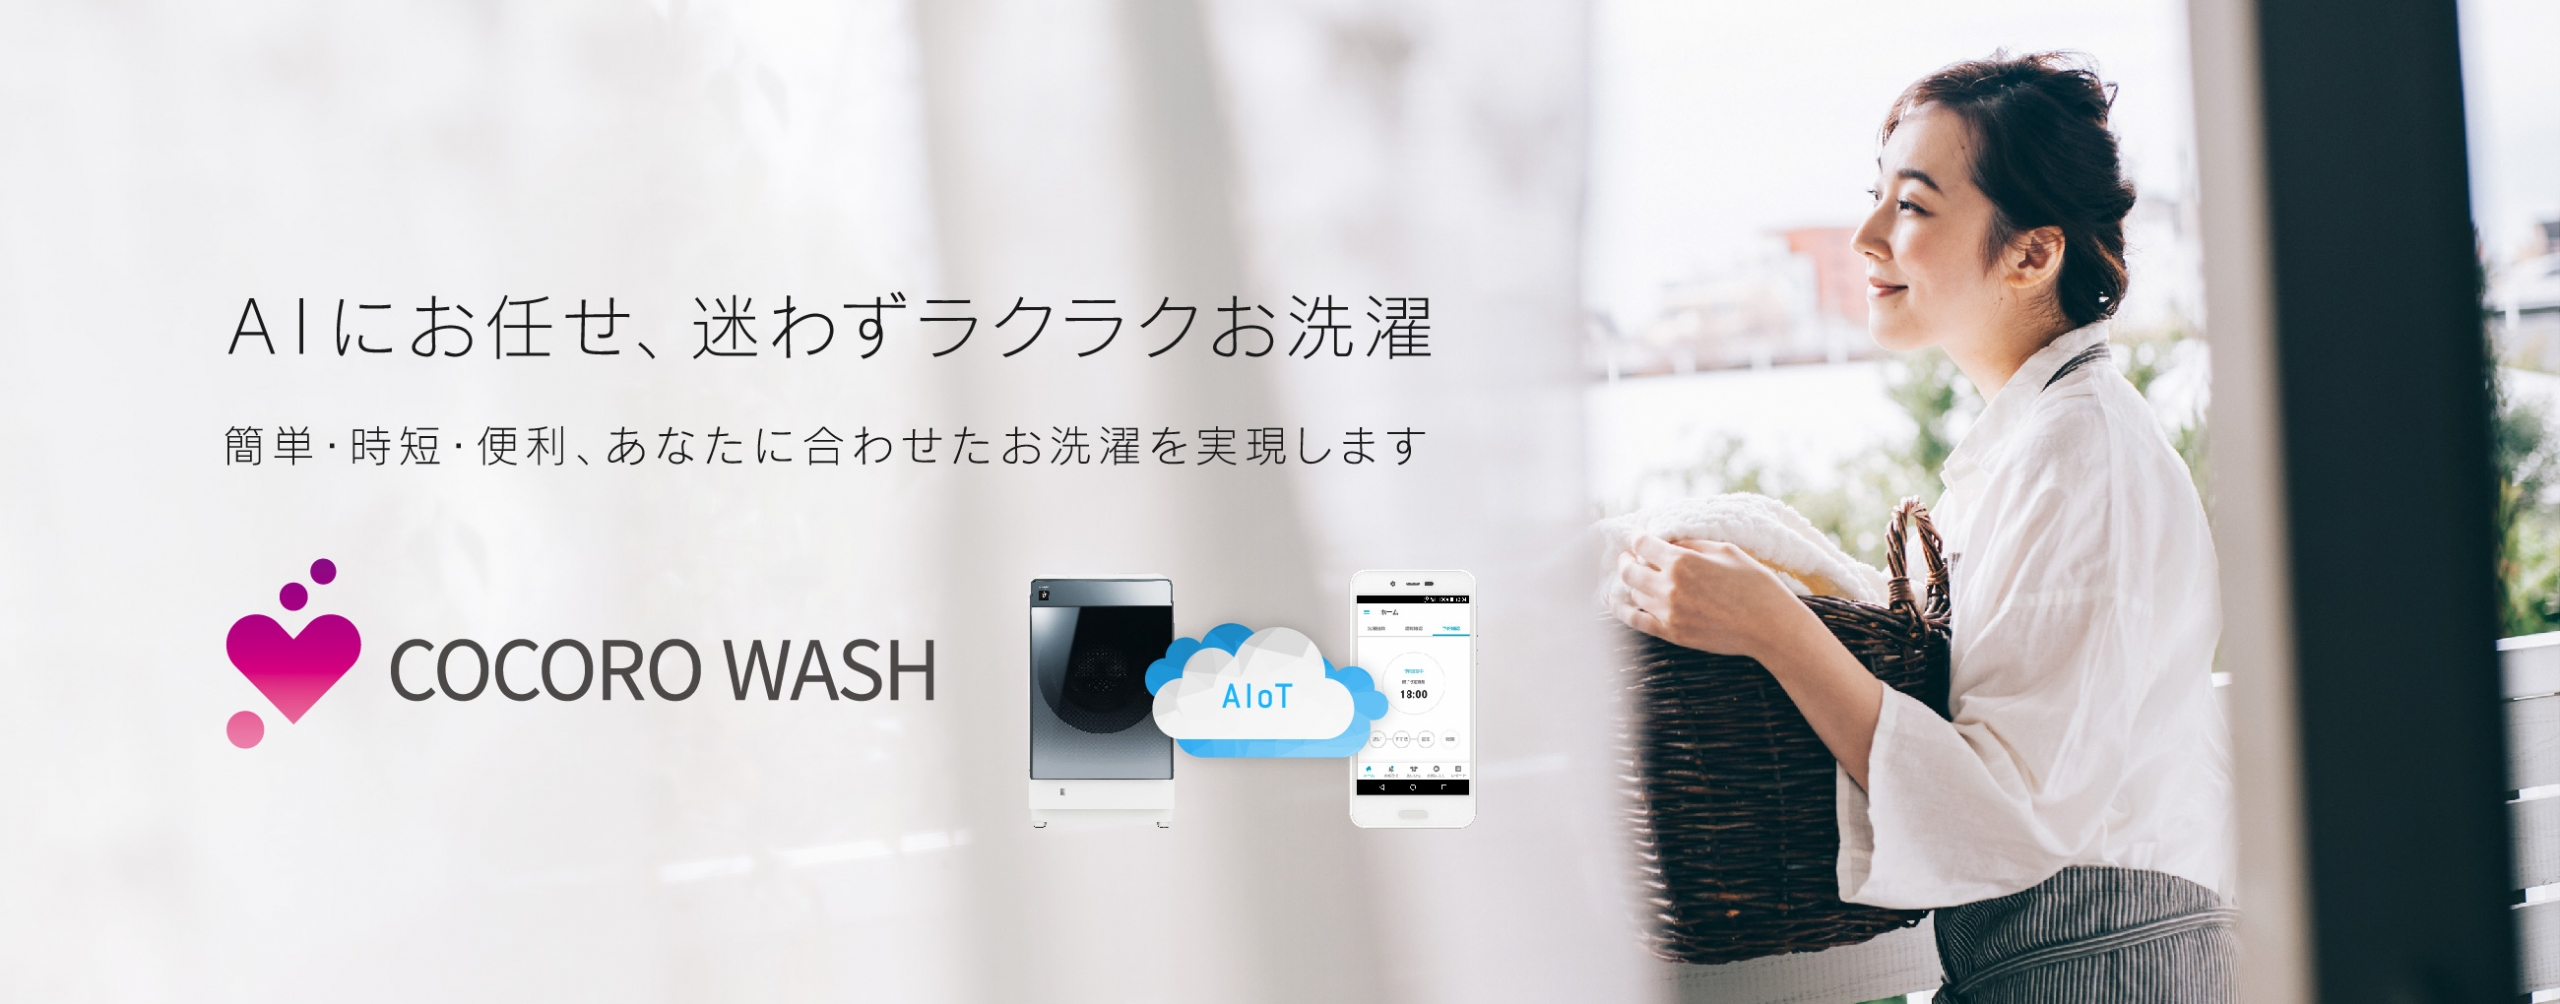 COCORO WASH AIにお任せ、迷わずラクラクお洗濯